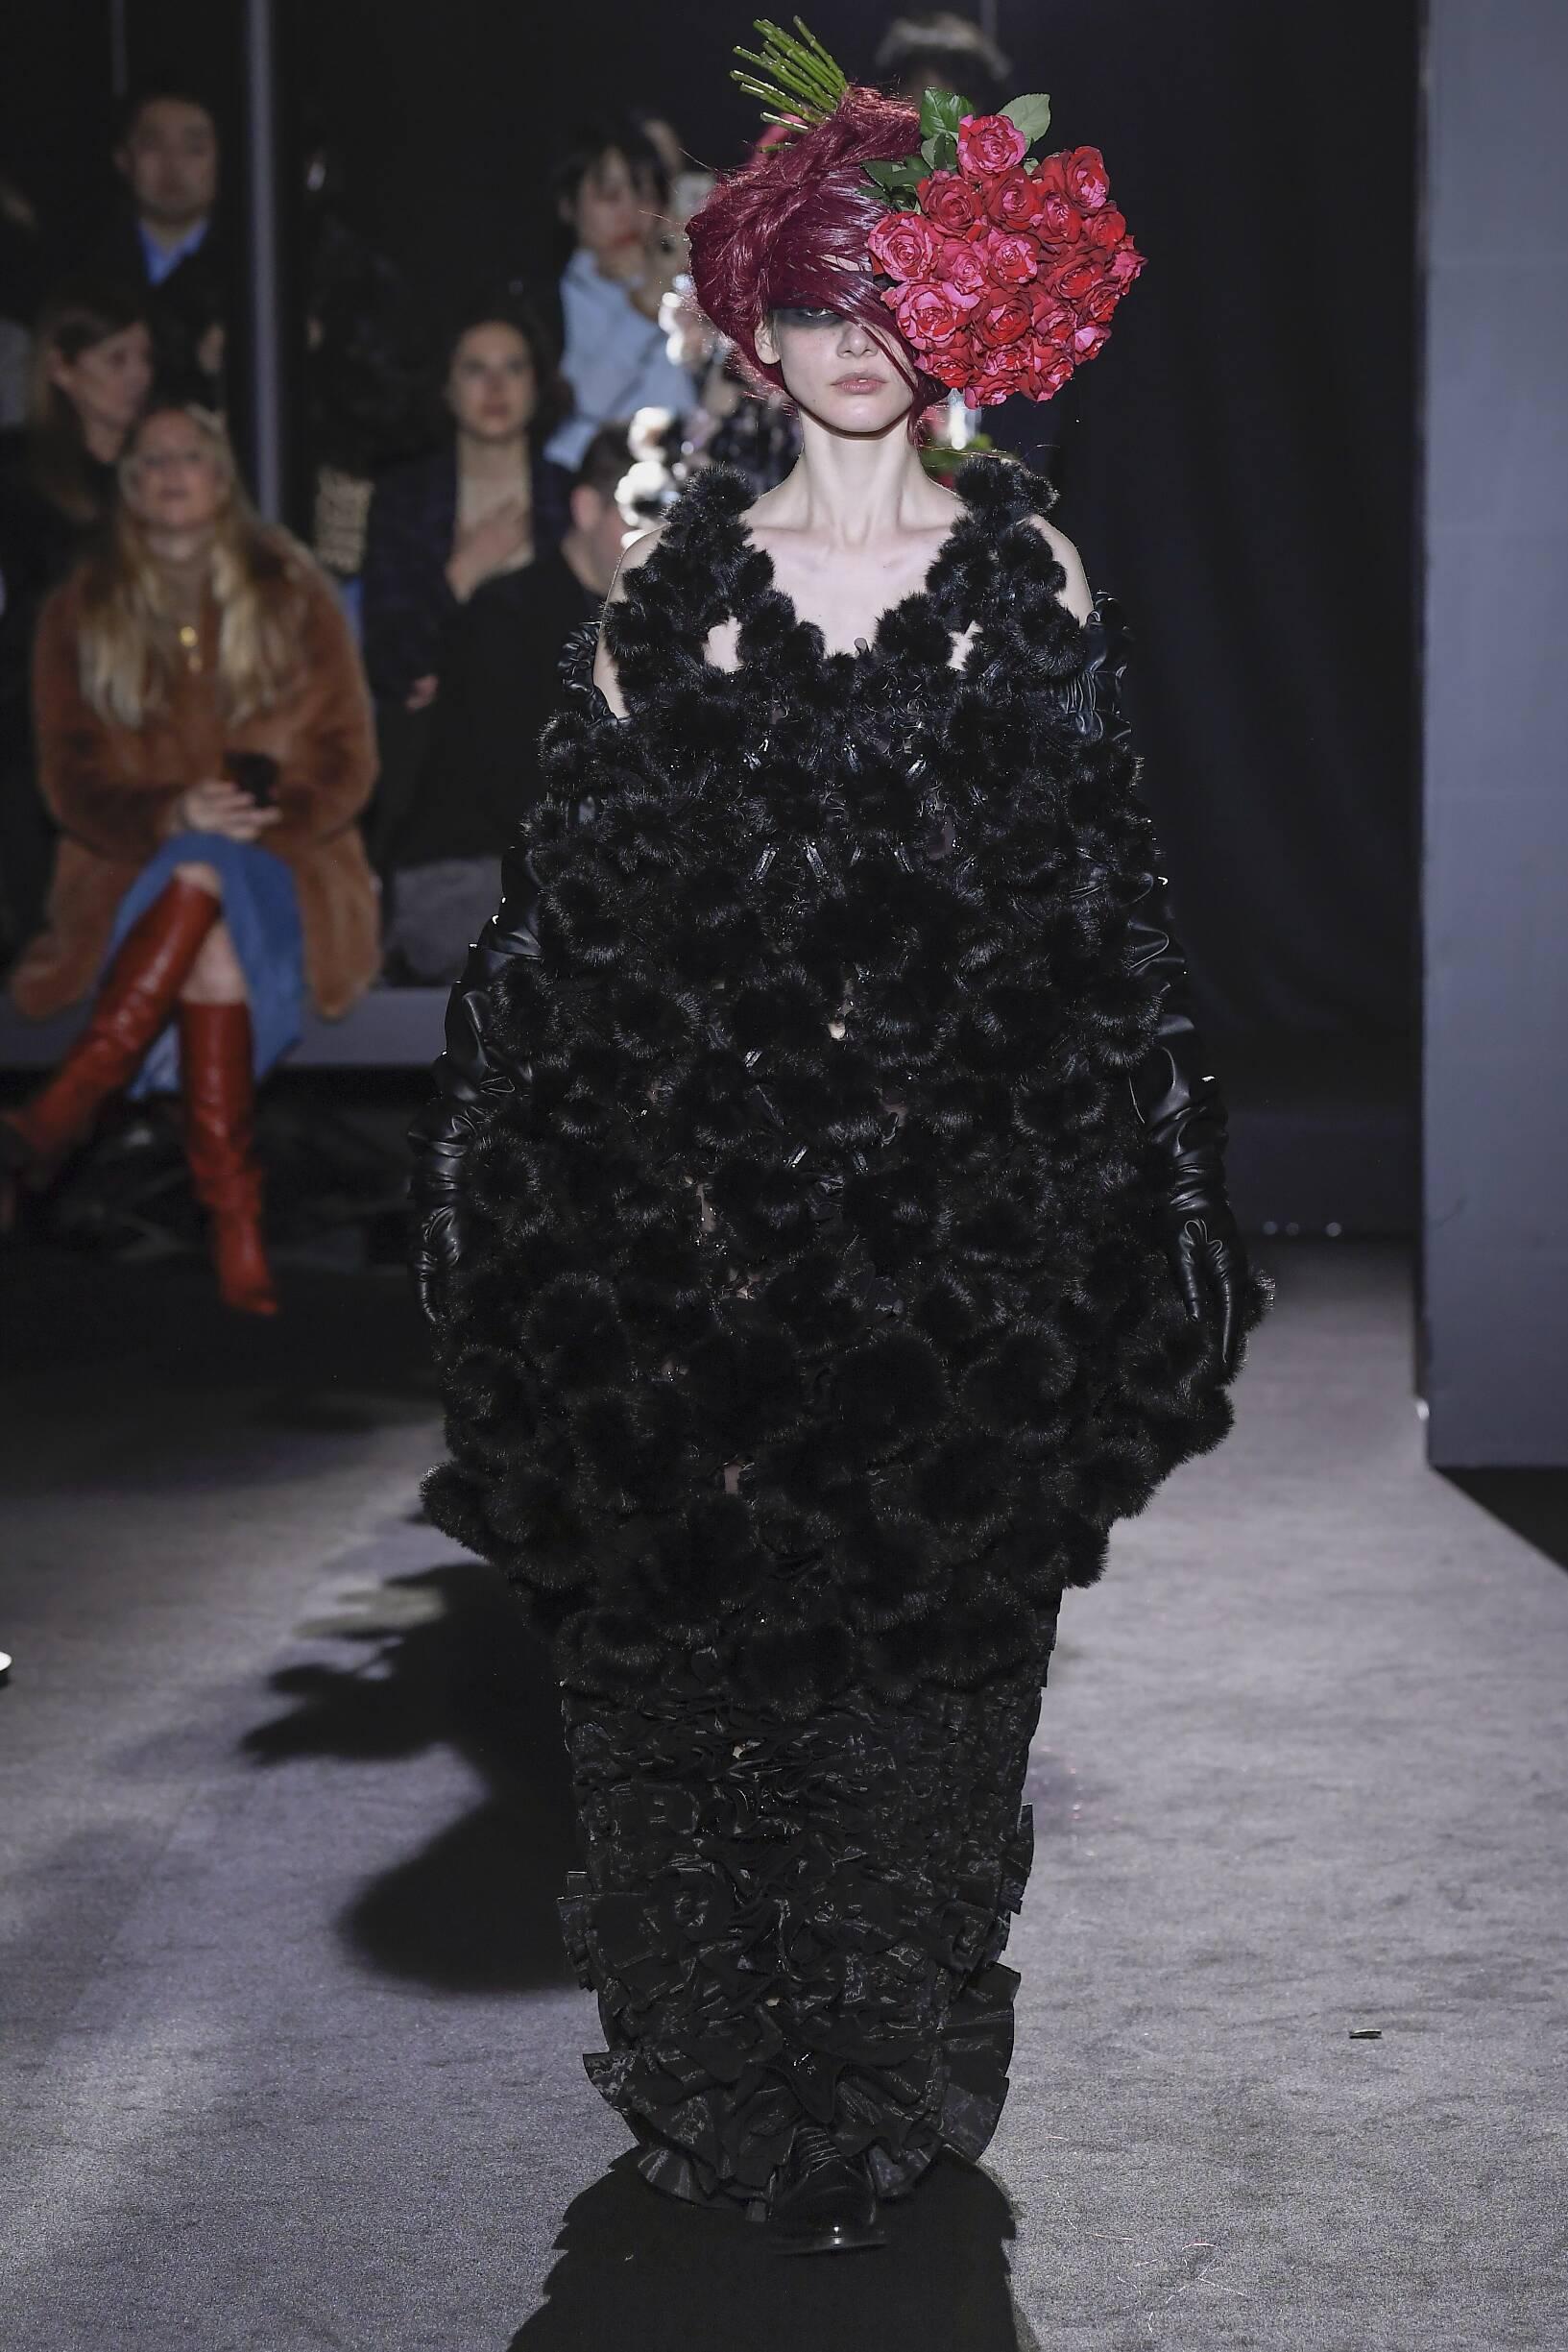 Catwalk Noir Kei Ninomiya Women Fashion Show Winter 2019